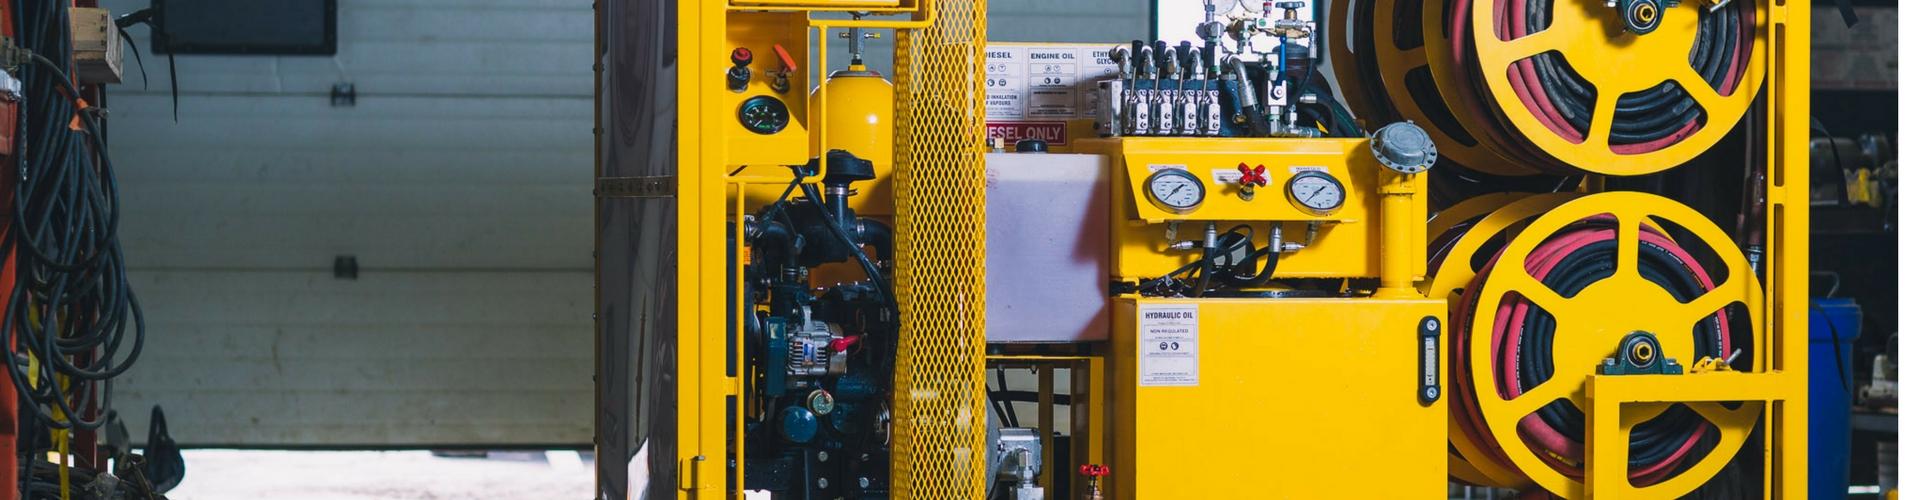 Oilfield accumulators